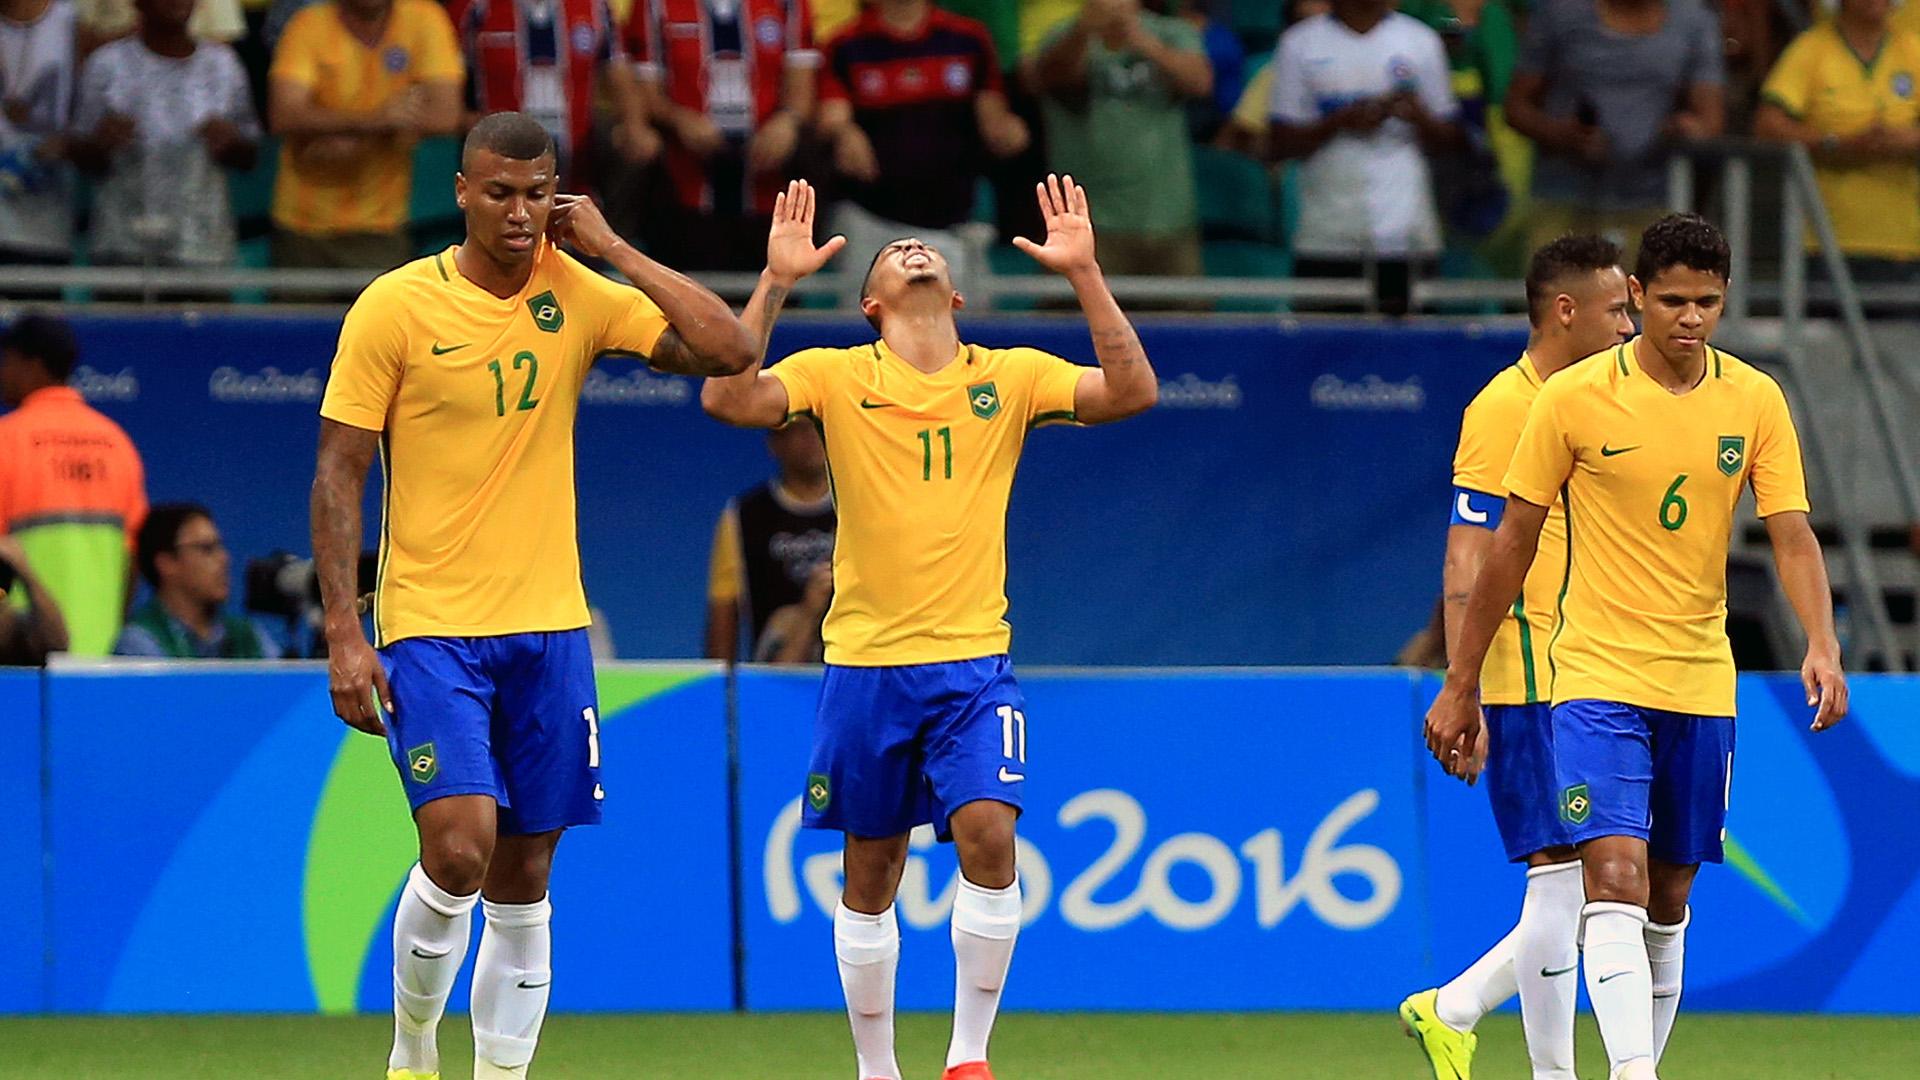 Gabriel Jesus Walace Douglas Santos Denmark Brazil Rio 2016 Olympics 10082016